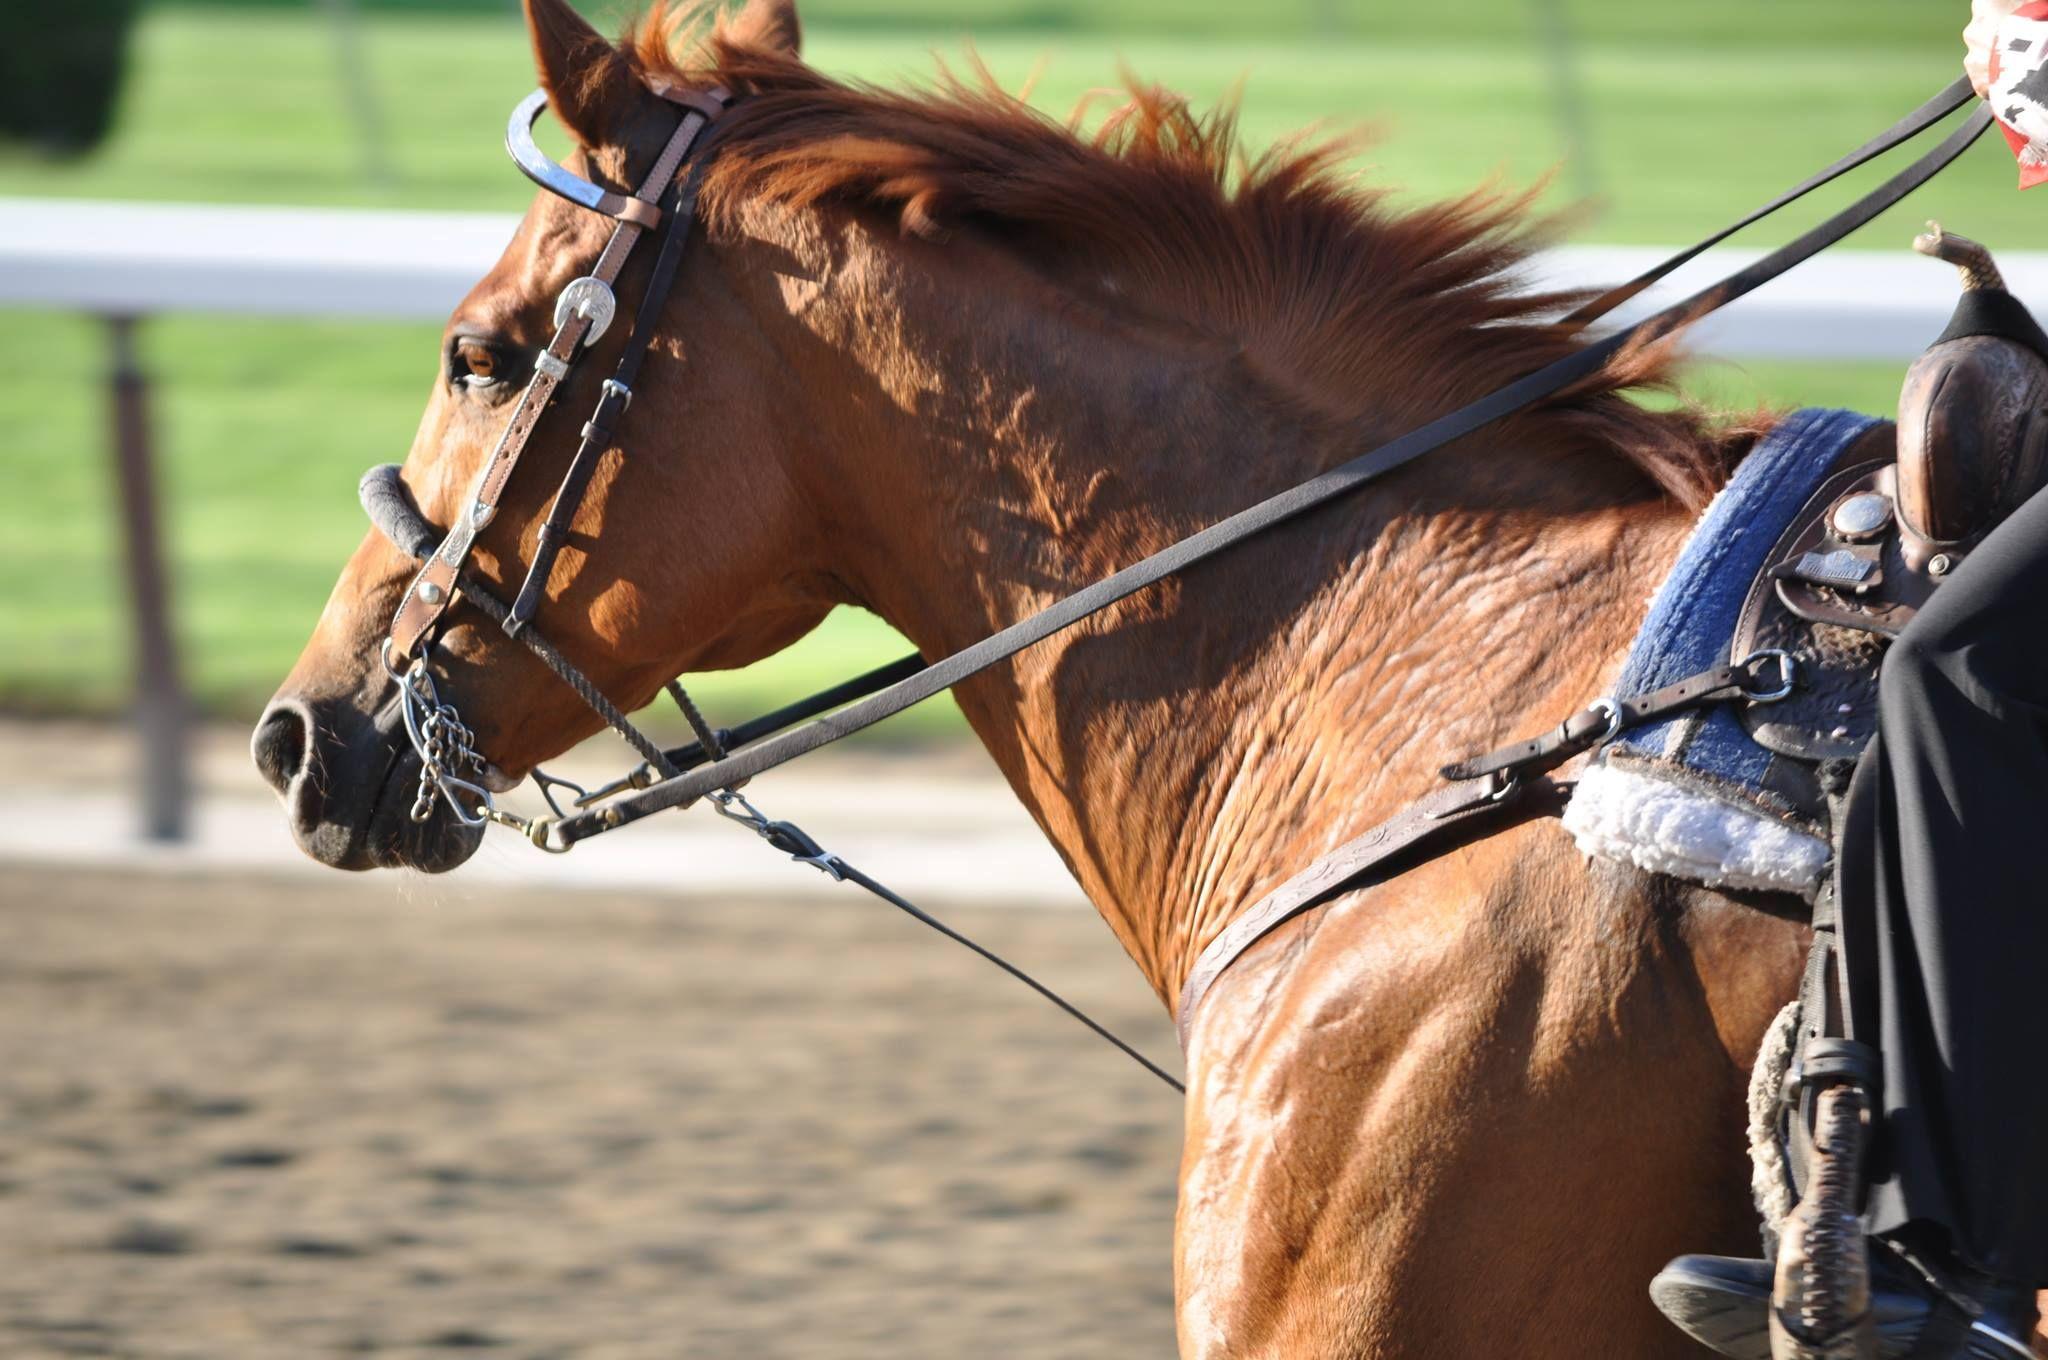 Belmont Race Track.  June 8th, 2013